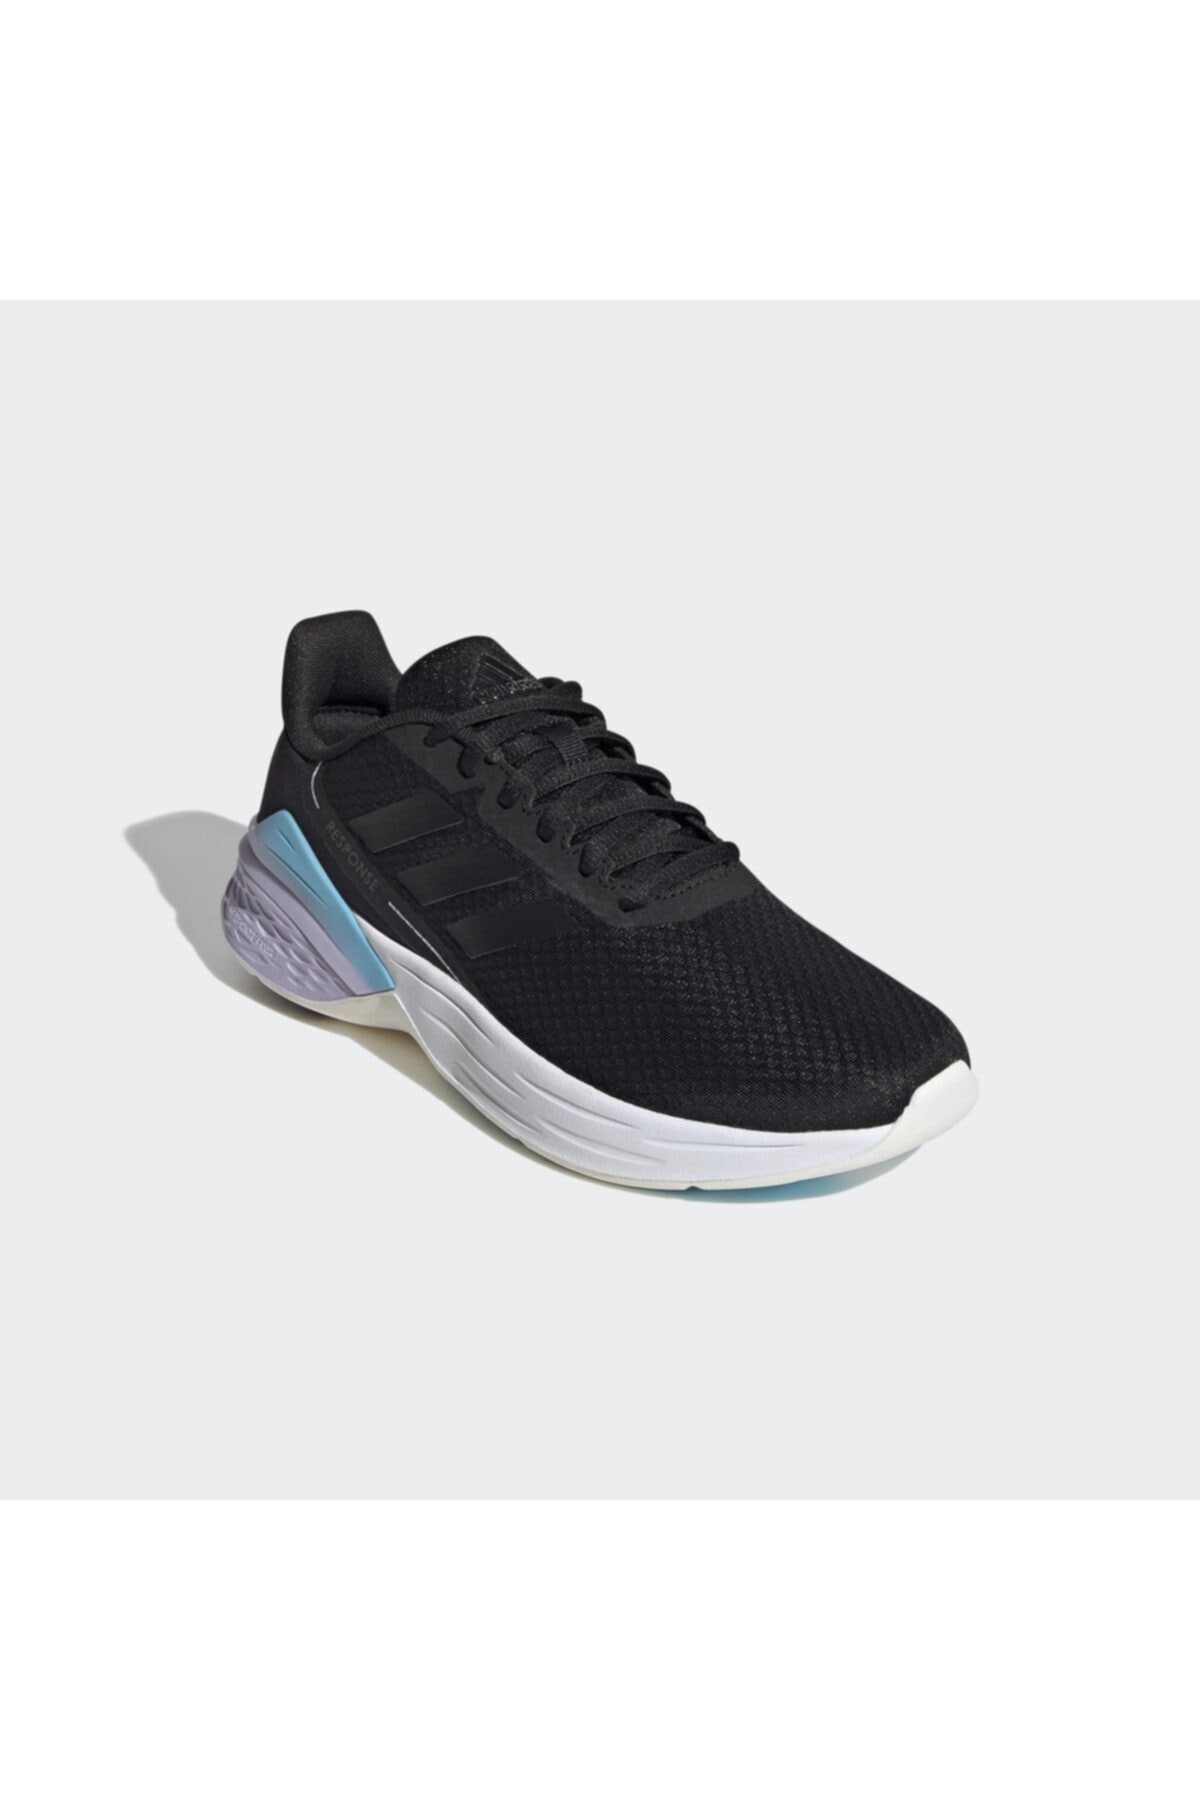 adidas Response Sr Siyah Kadın Koşu Ayakkabısı Fx8914 1